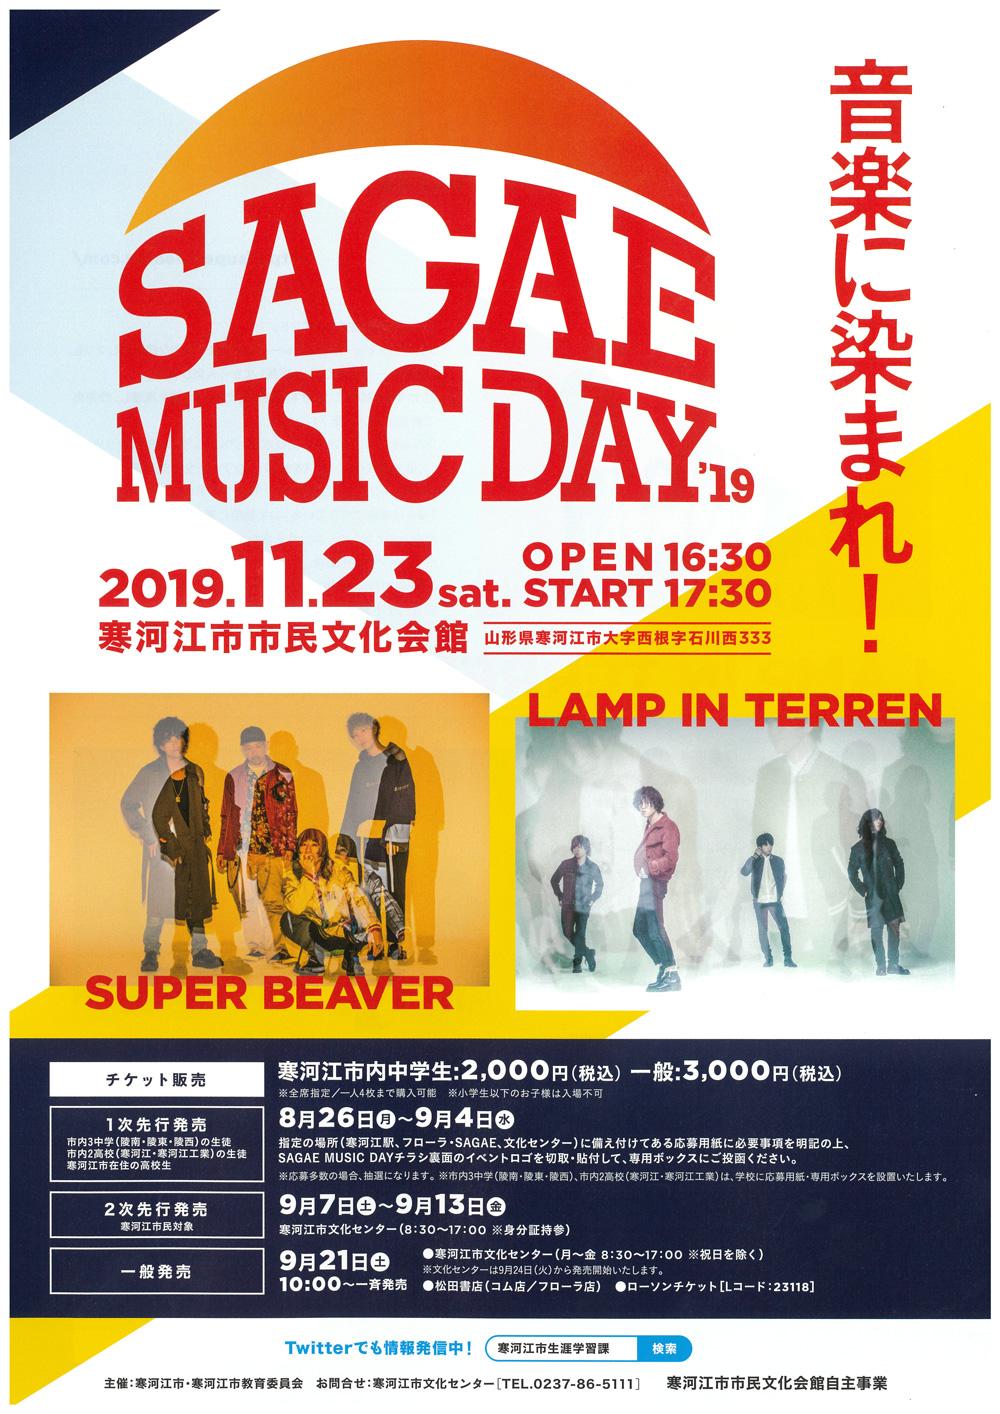 SAGAE Music Day '19